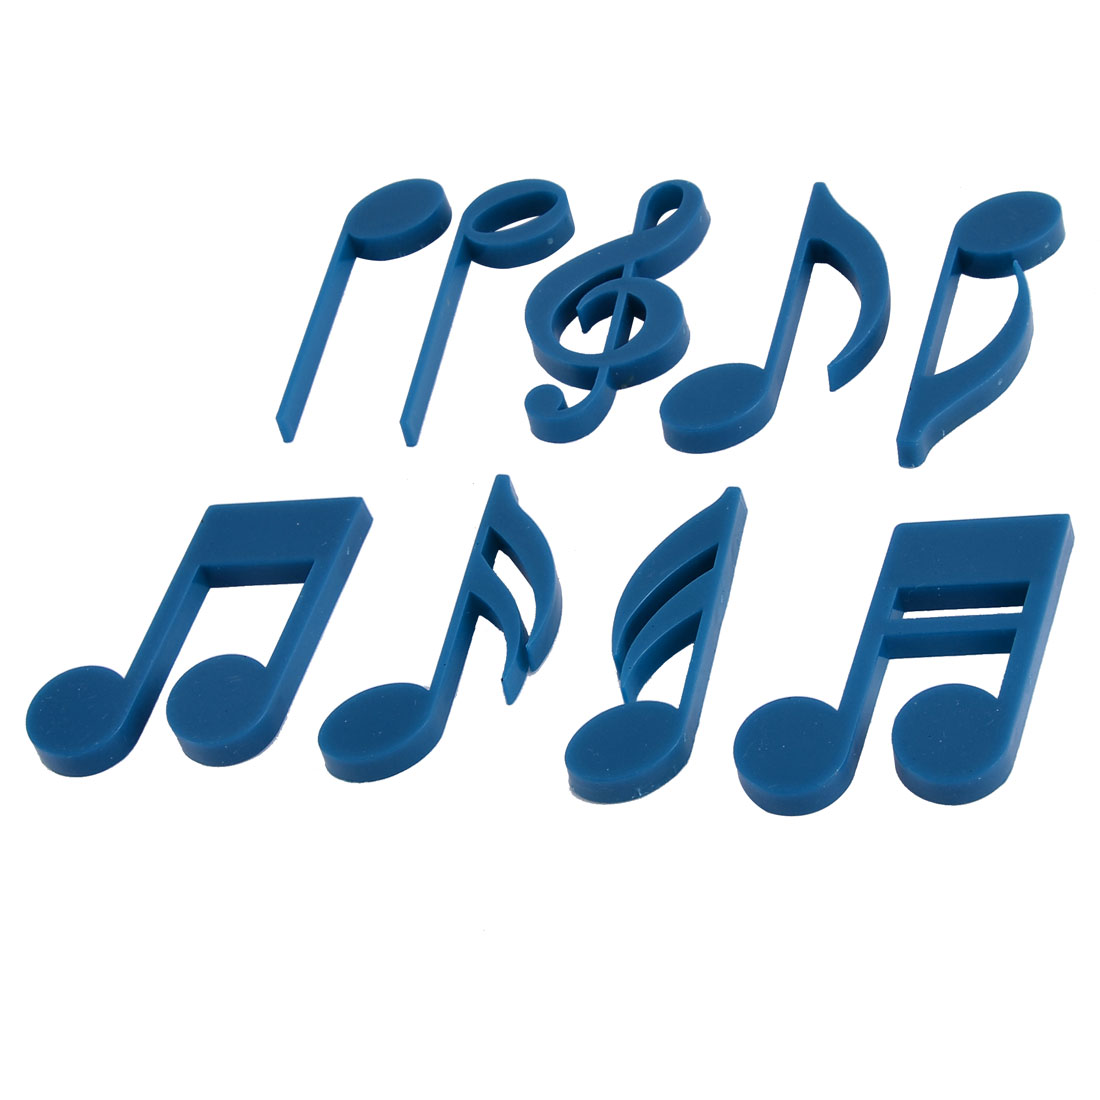 Kitchen Office Blackboard Washer Musical Note Design Fridge Magnets Blue 9 in 1